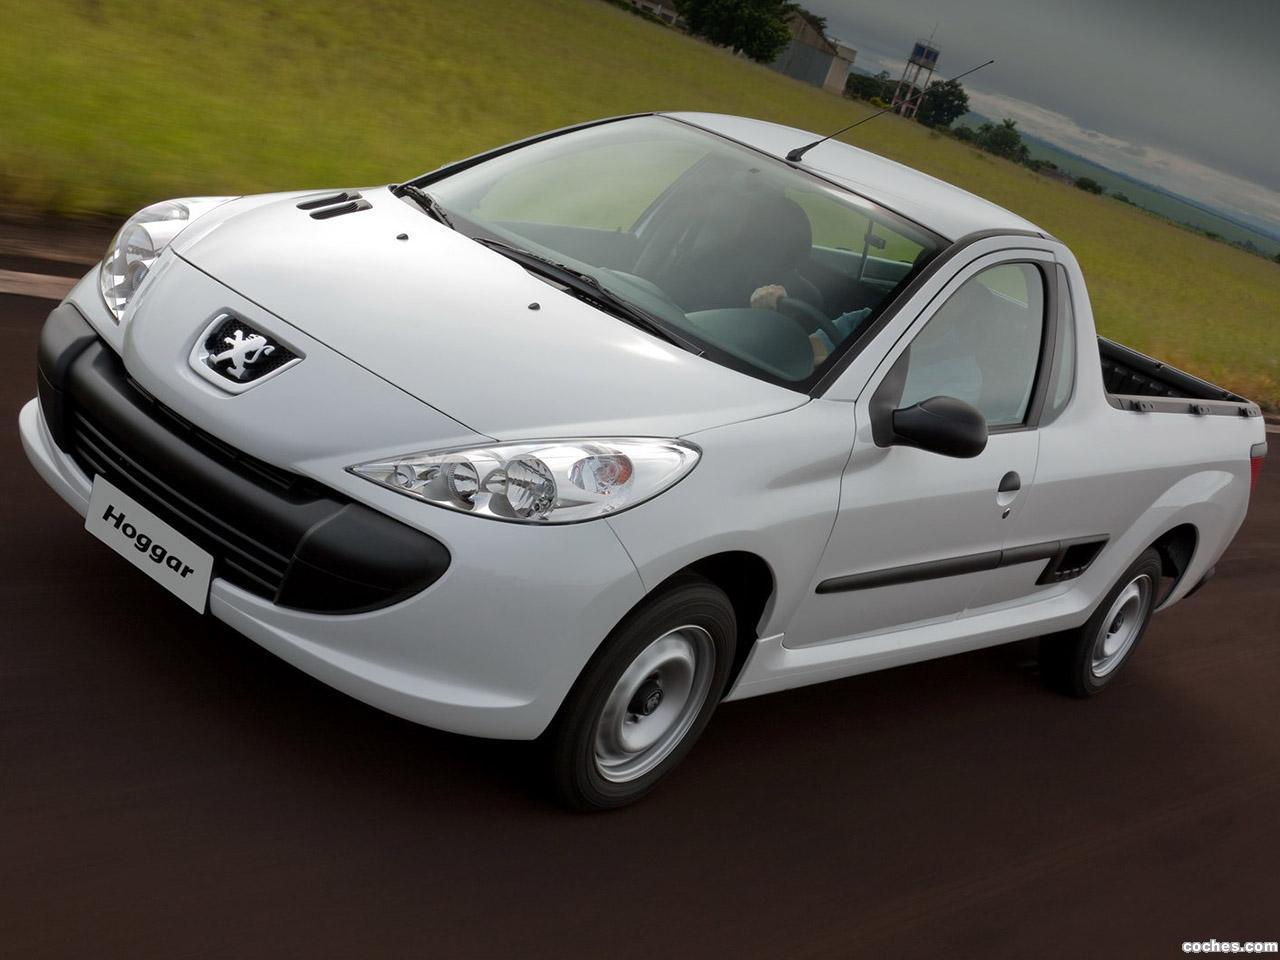 Foto 0 de Peugeot 207 Hoggar 2010